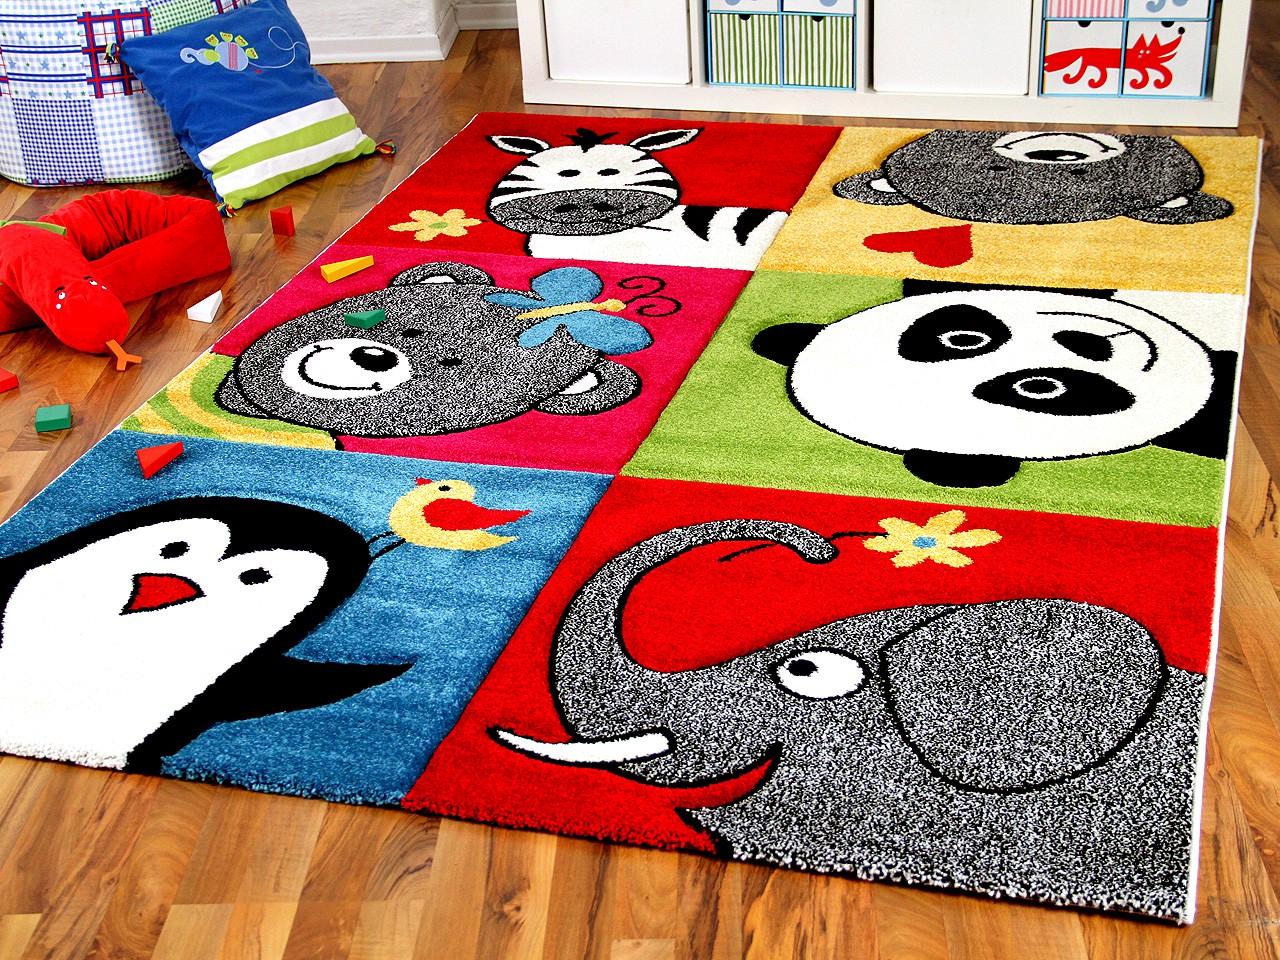 kinder teppich savona kids lustige zootiere bunt teppiche. Black Bedroom Furniture Sets. Home Design Ideas